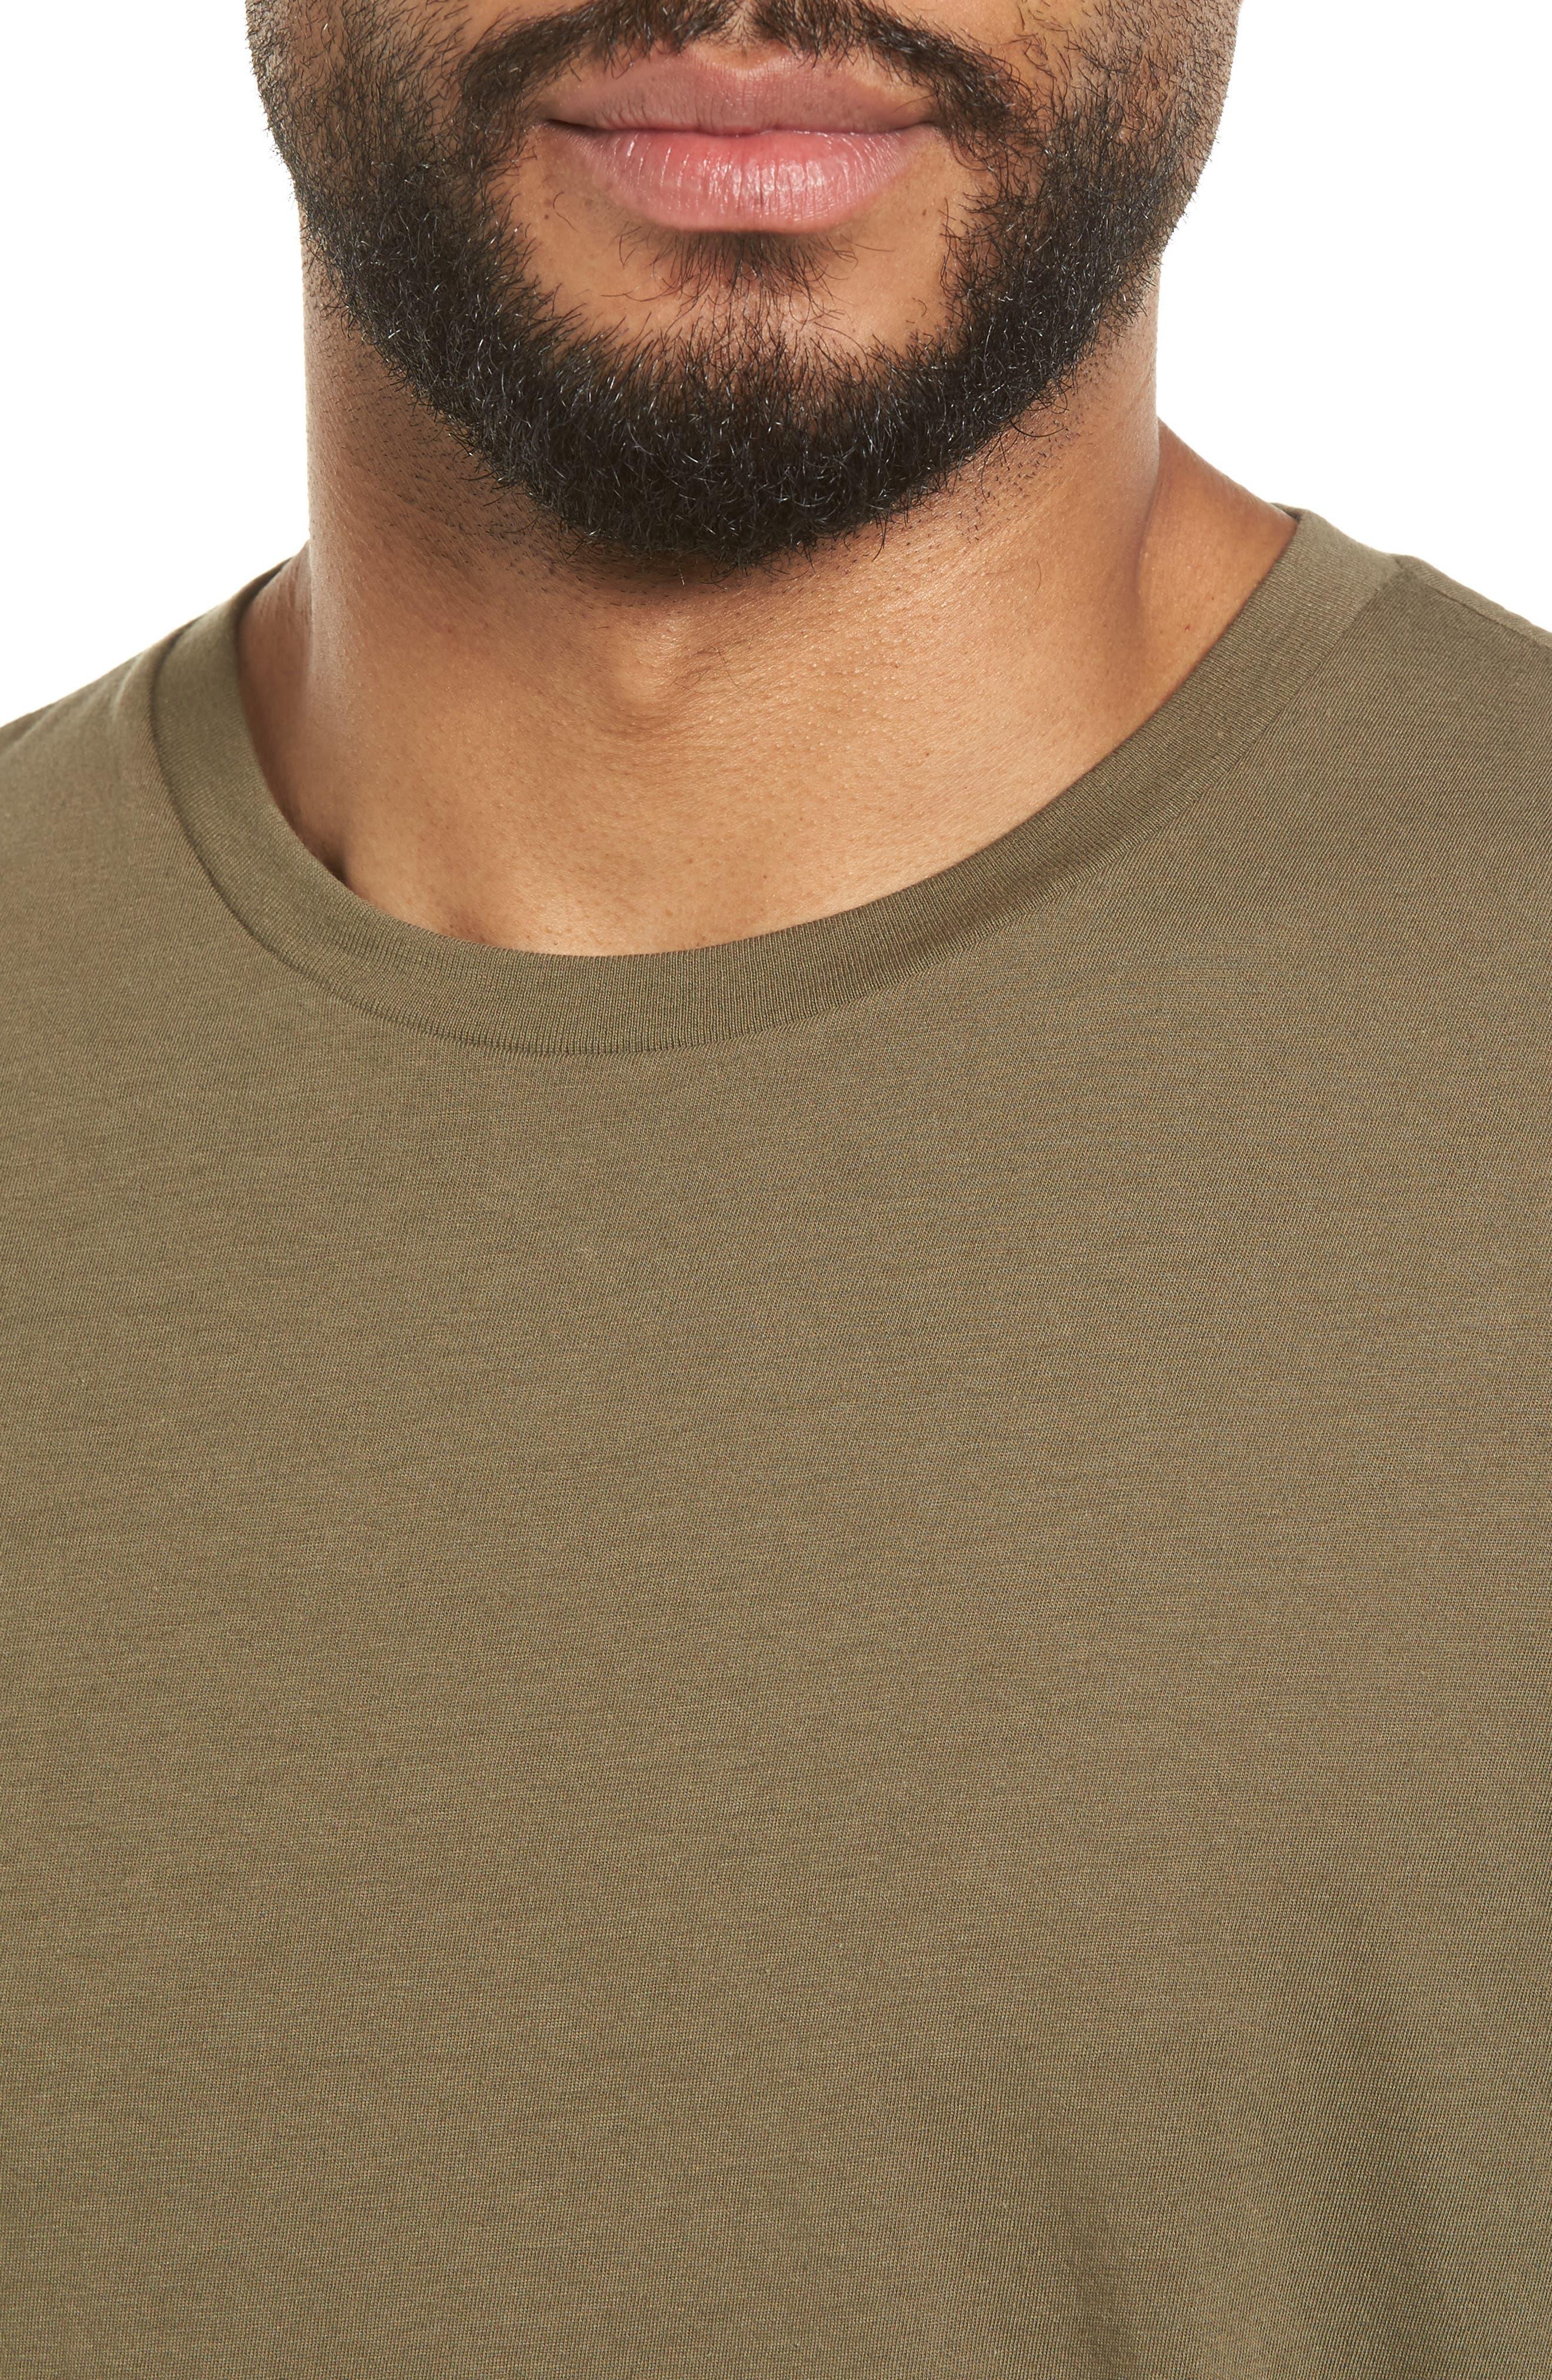 Slim Fit T-Shirt,                             Alternate thumbnail 4, color,                             300